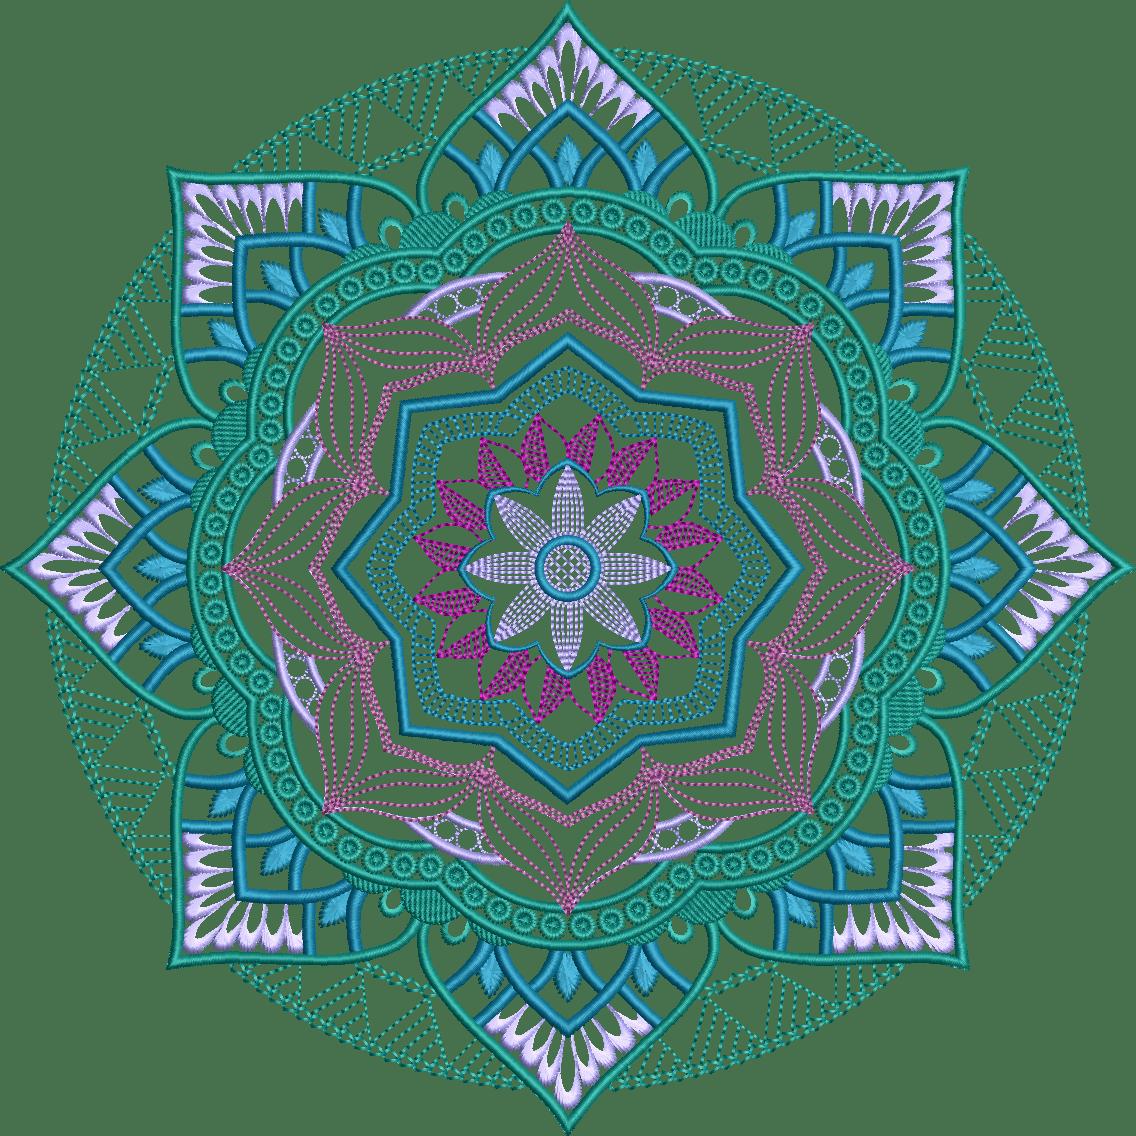 Kkzmandala1